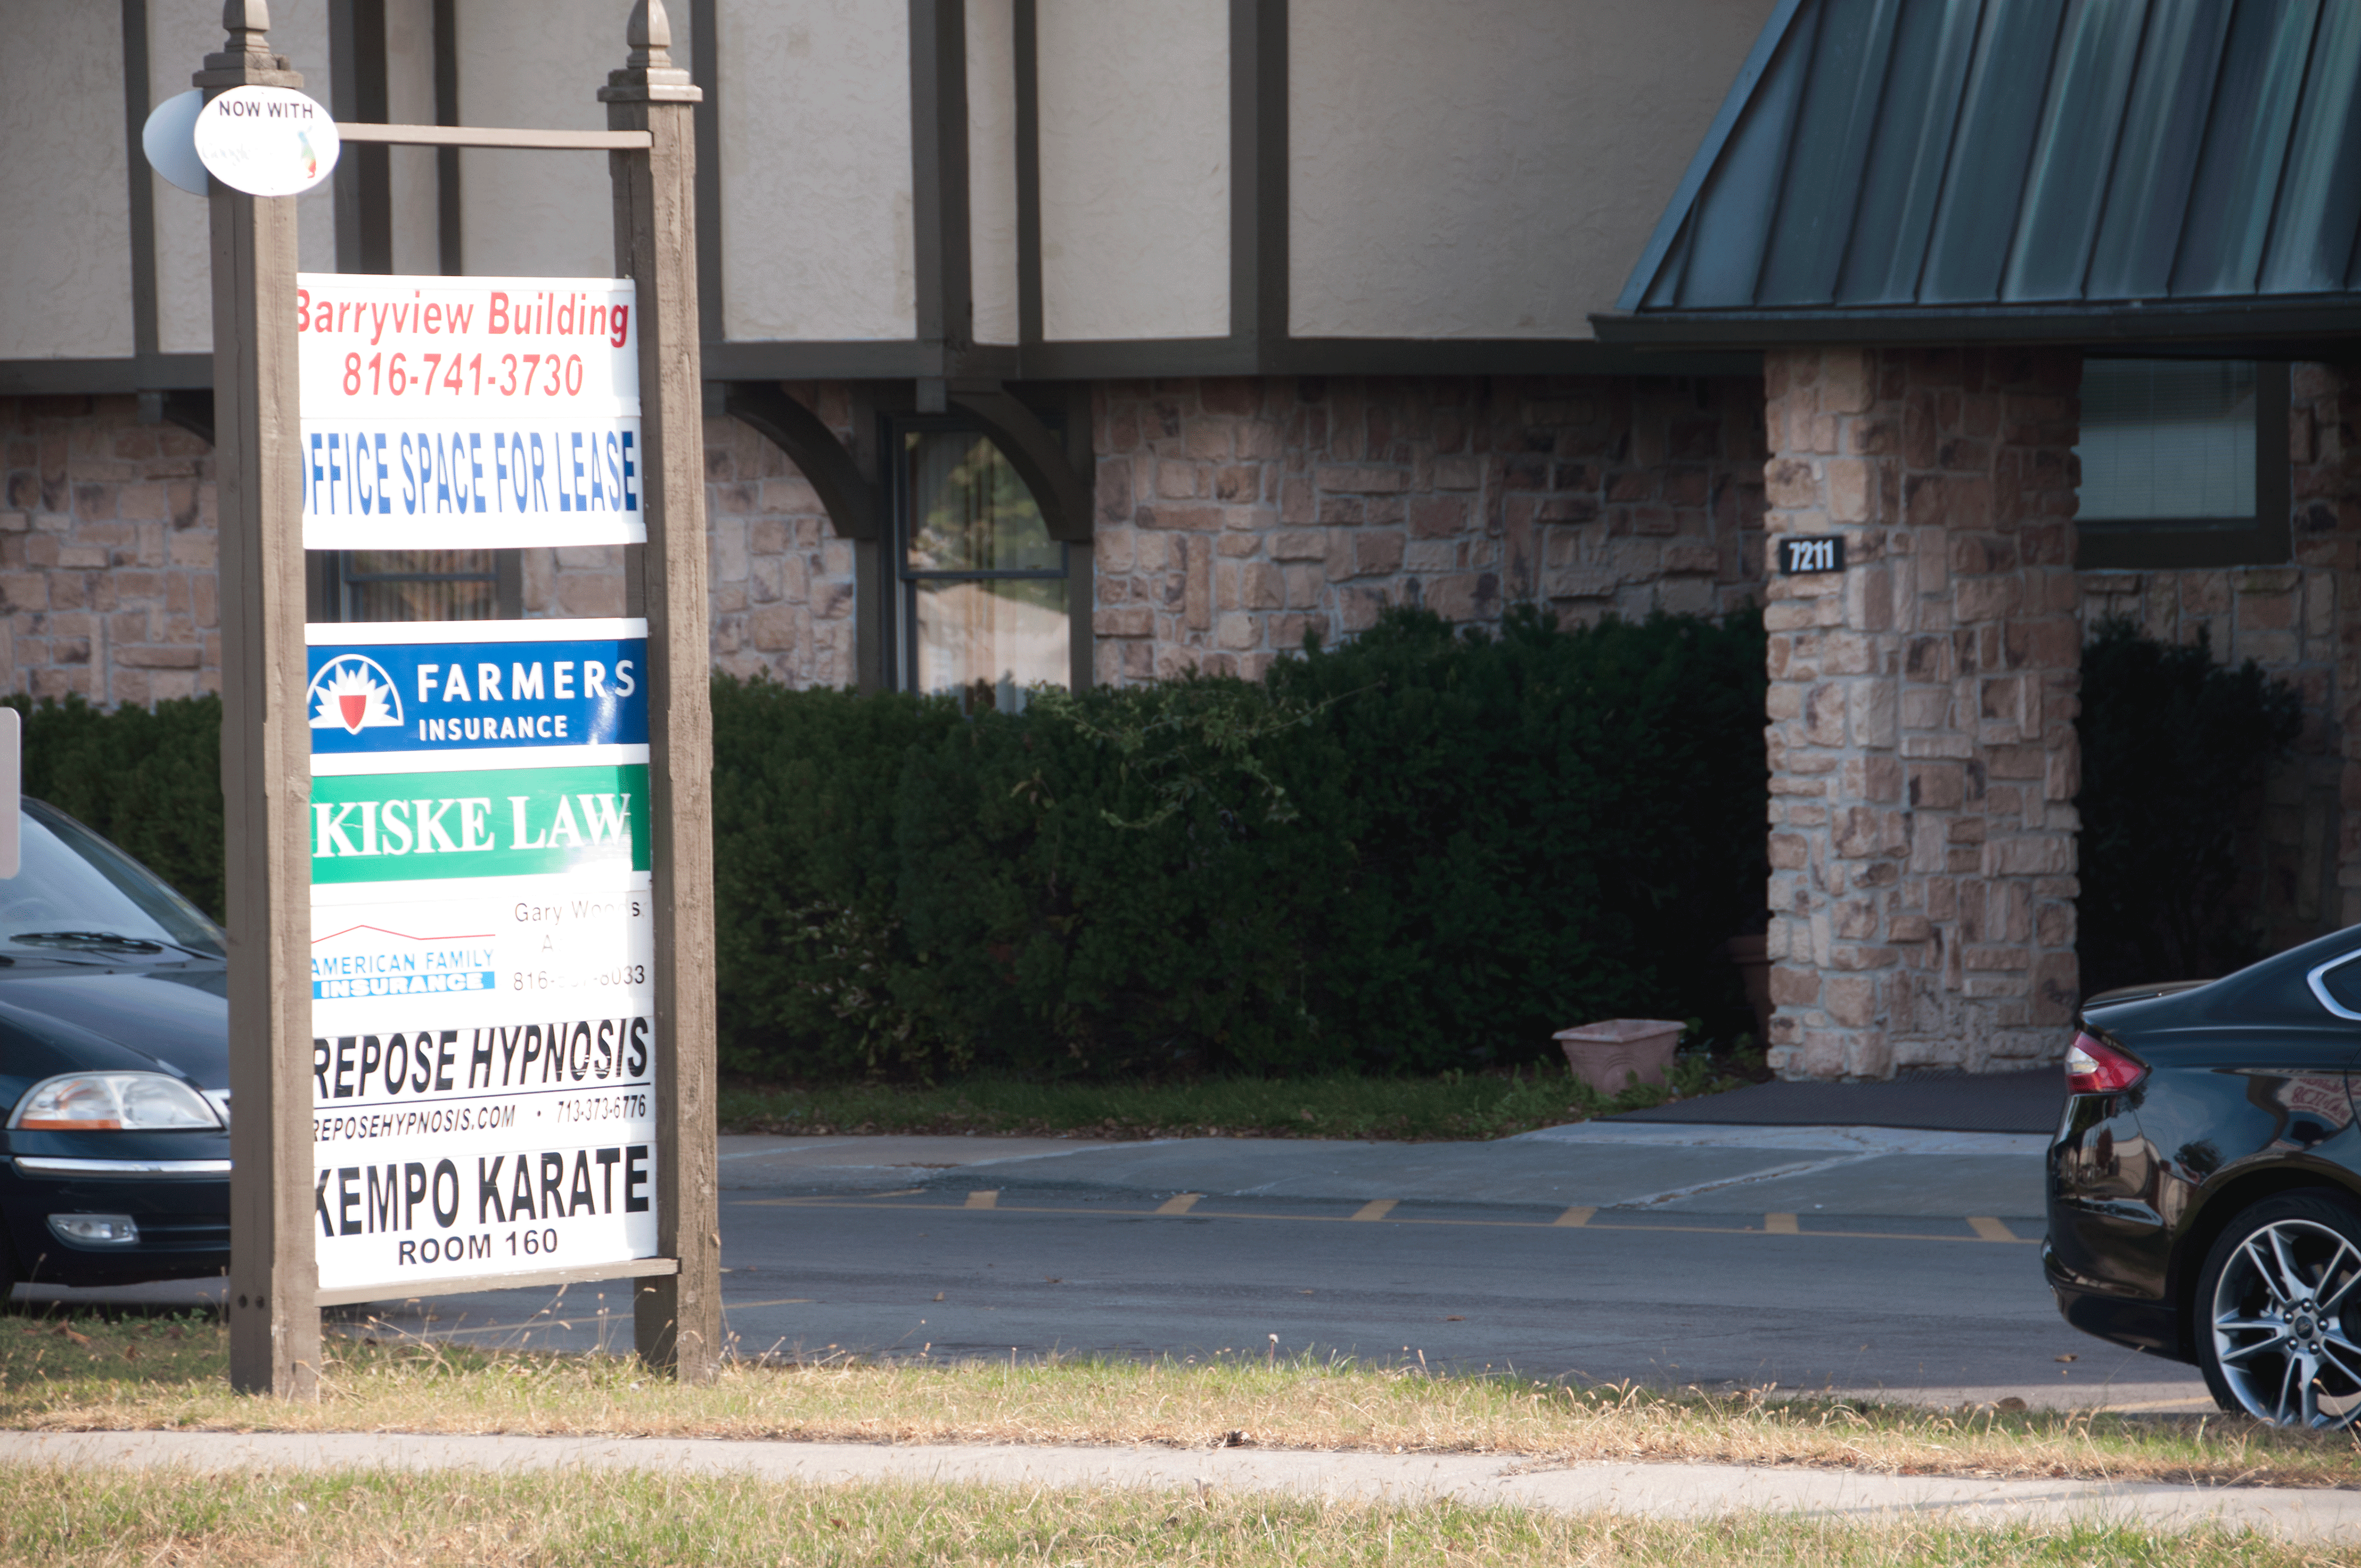 Kiske Law Office, LLC image 18